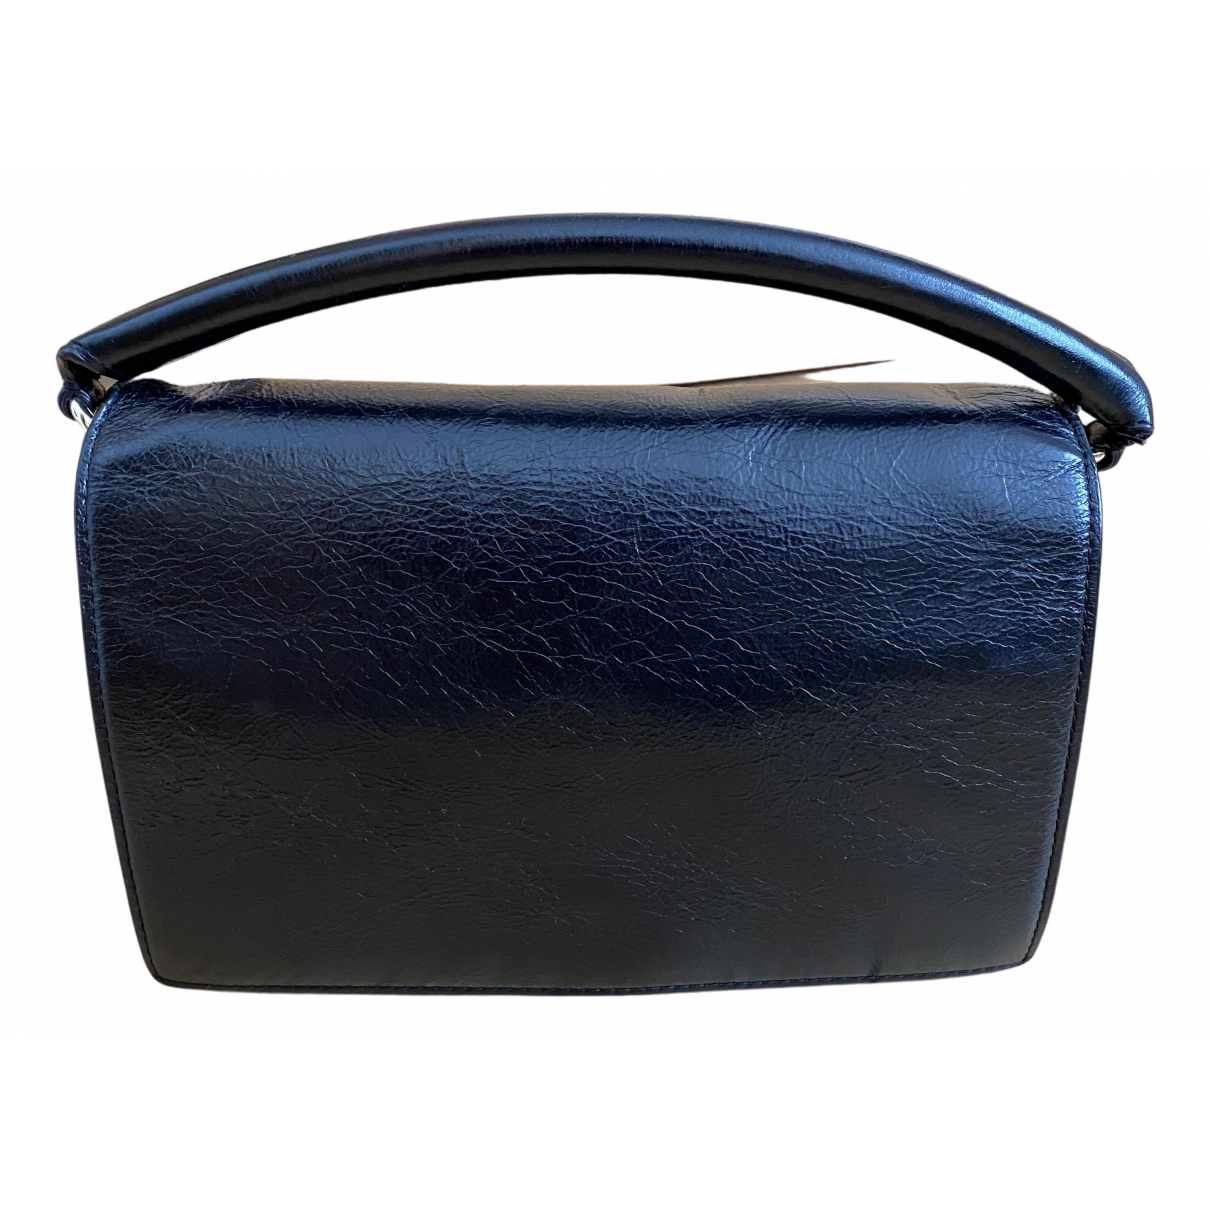 Diane Von Furstenberg - Sac a main   pour femme en cuir - noir